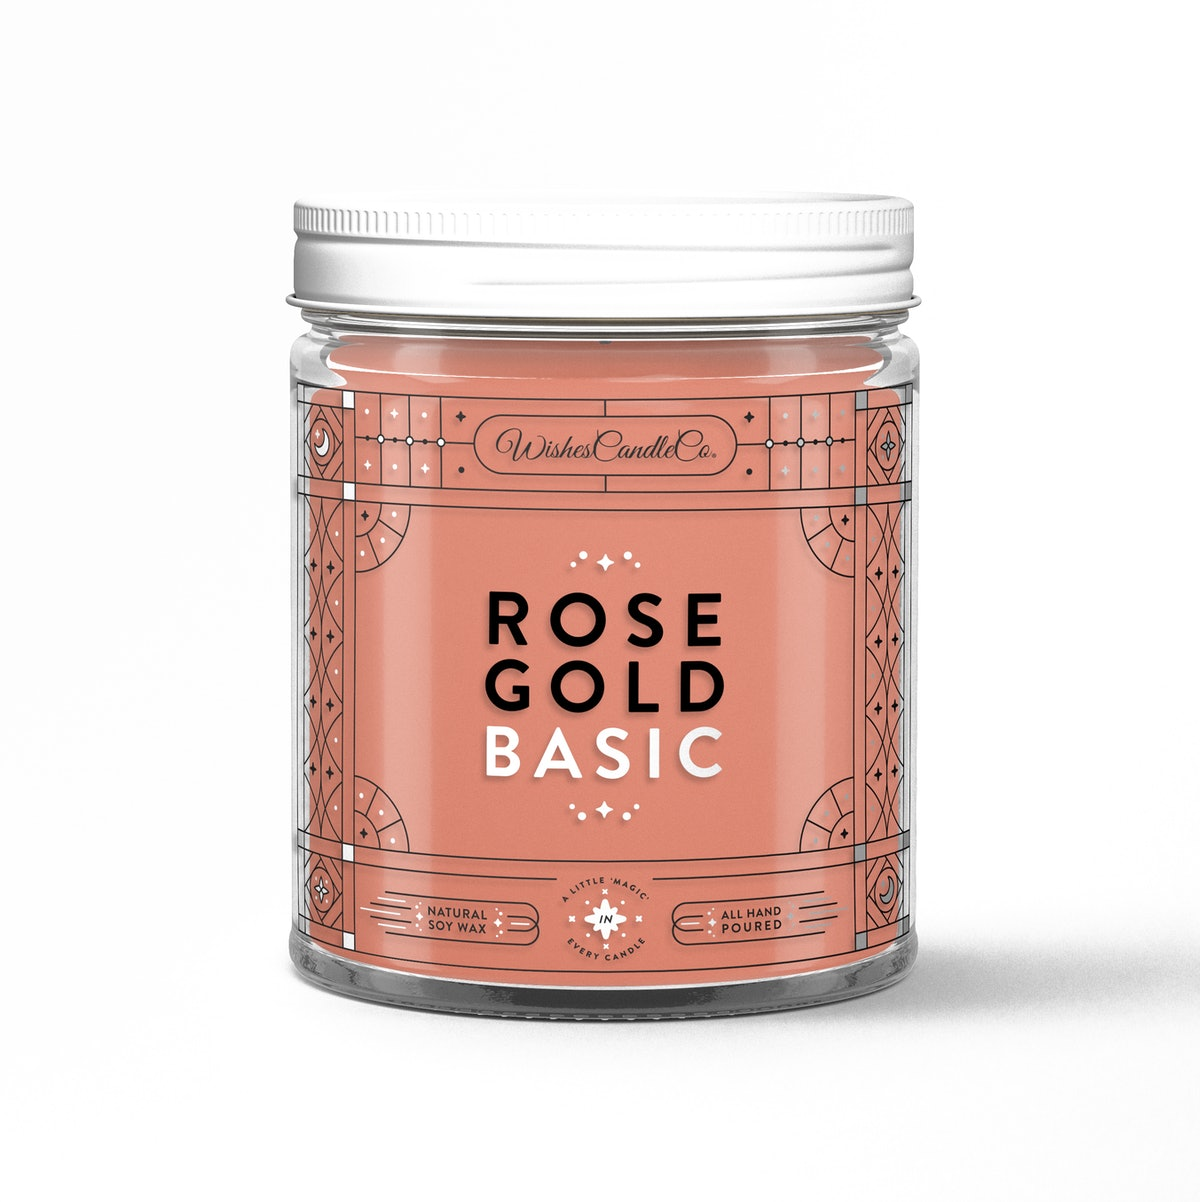 Rose Gold Basic